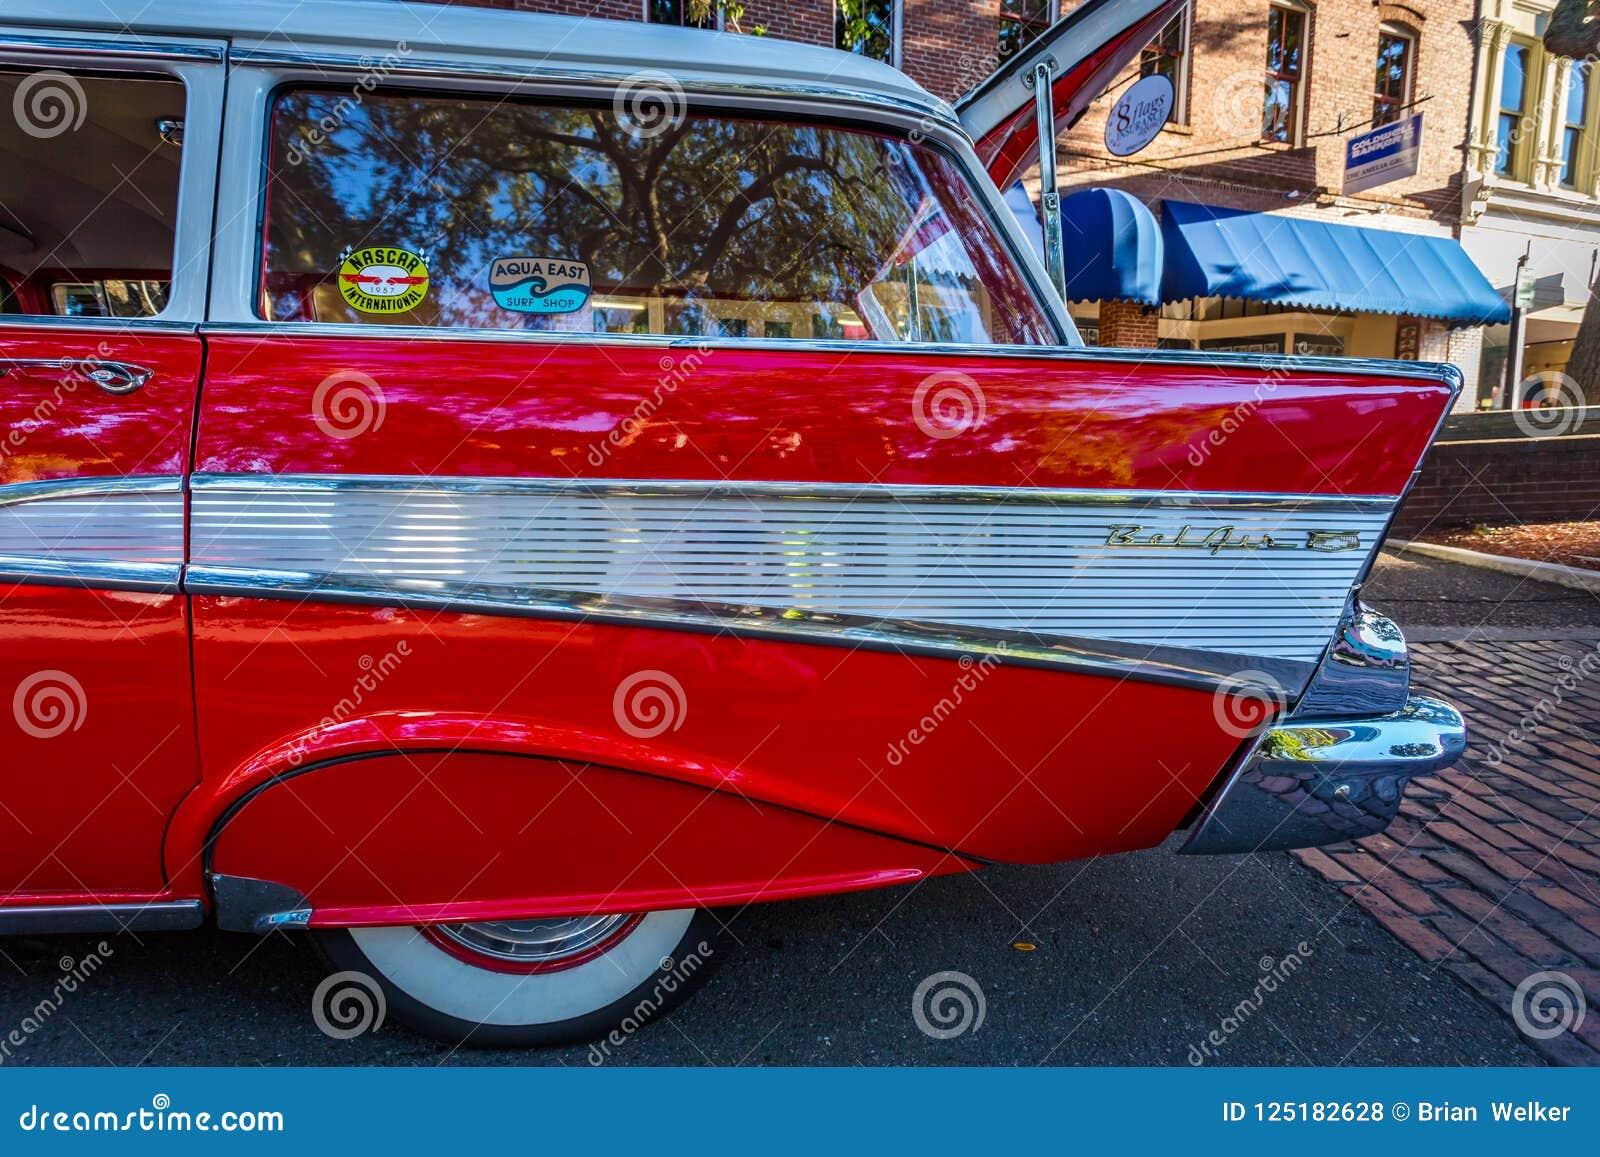 Chevrolet BelAir Station Wagon Editorial Stock Photo Image Of - Amelia car show